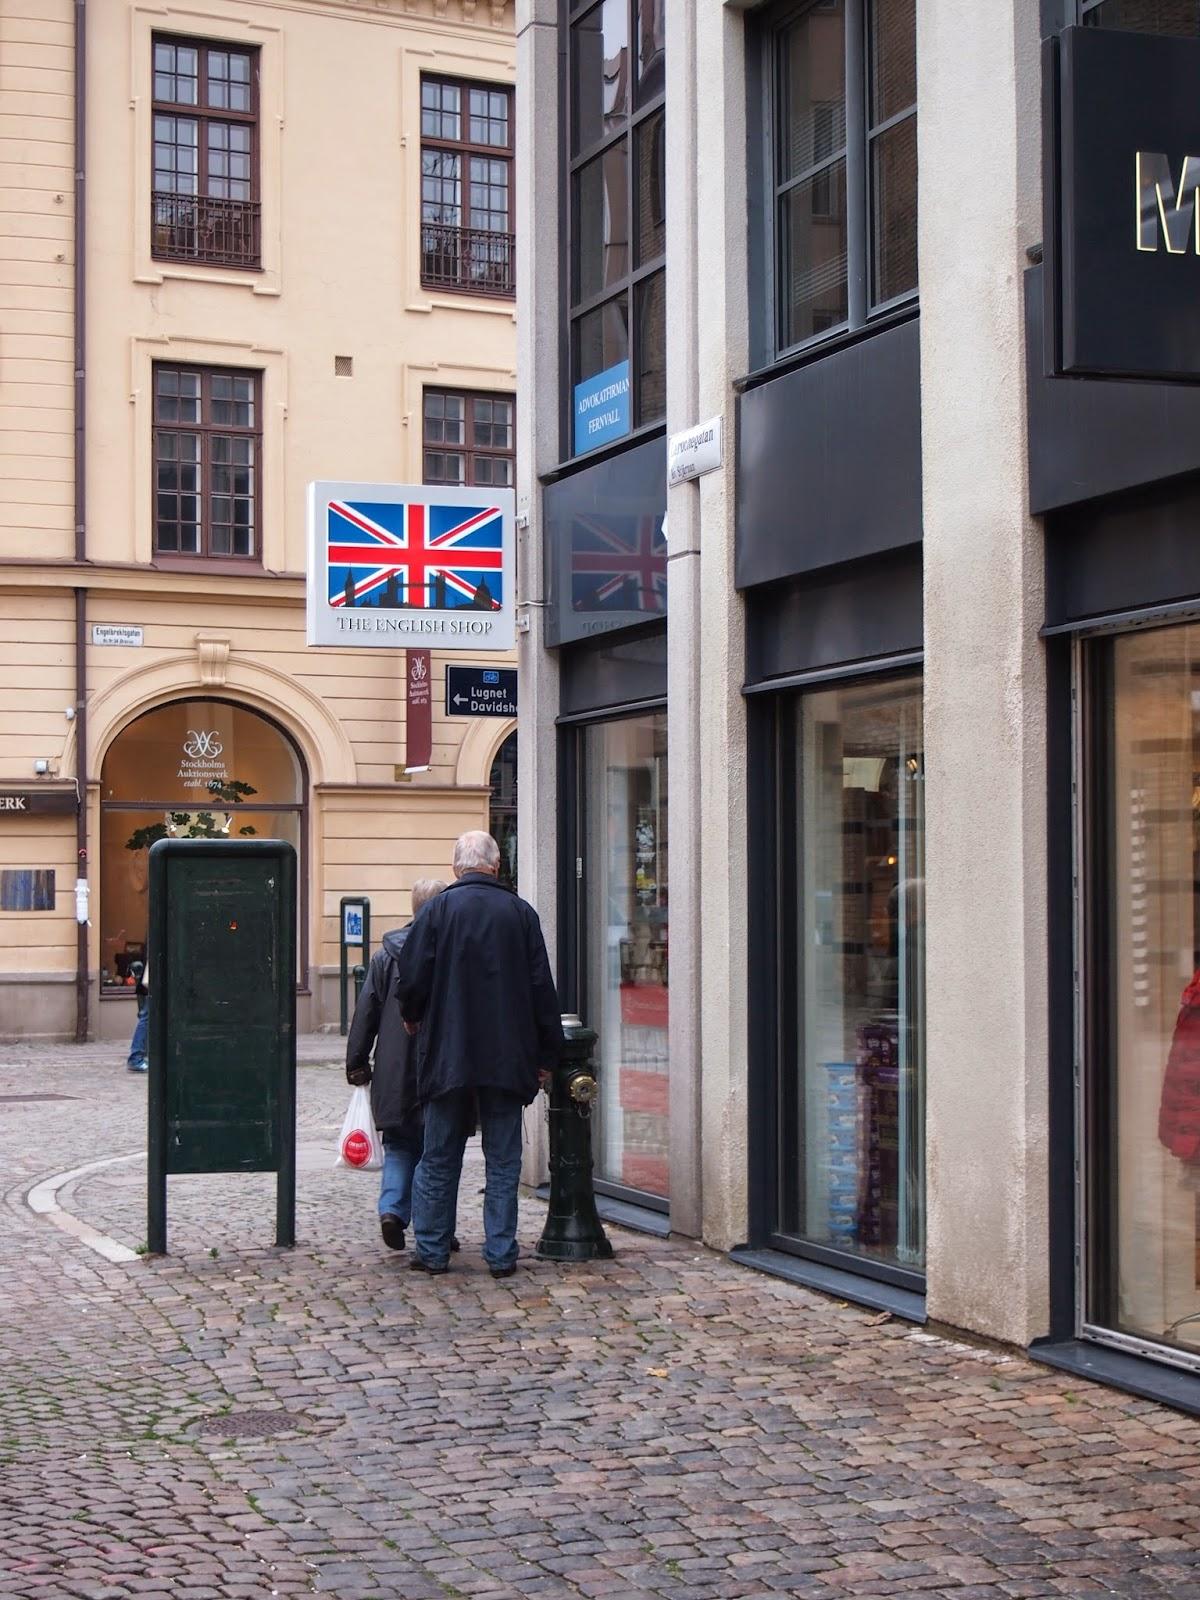 The English Shop in Malmo